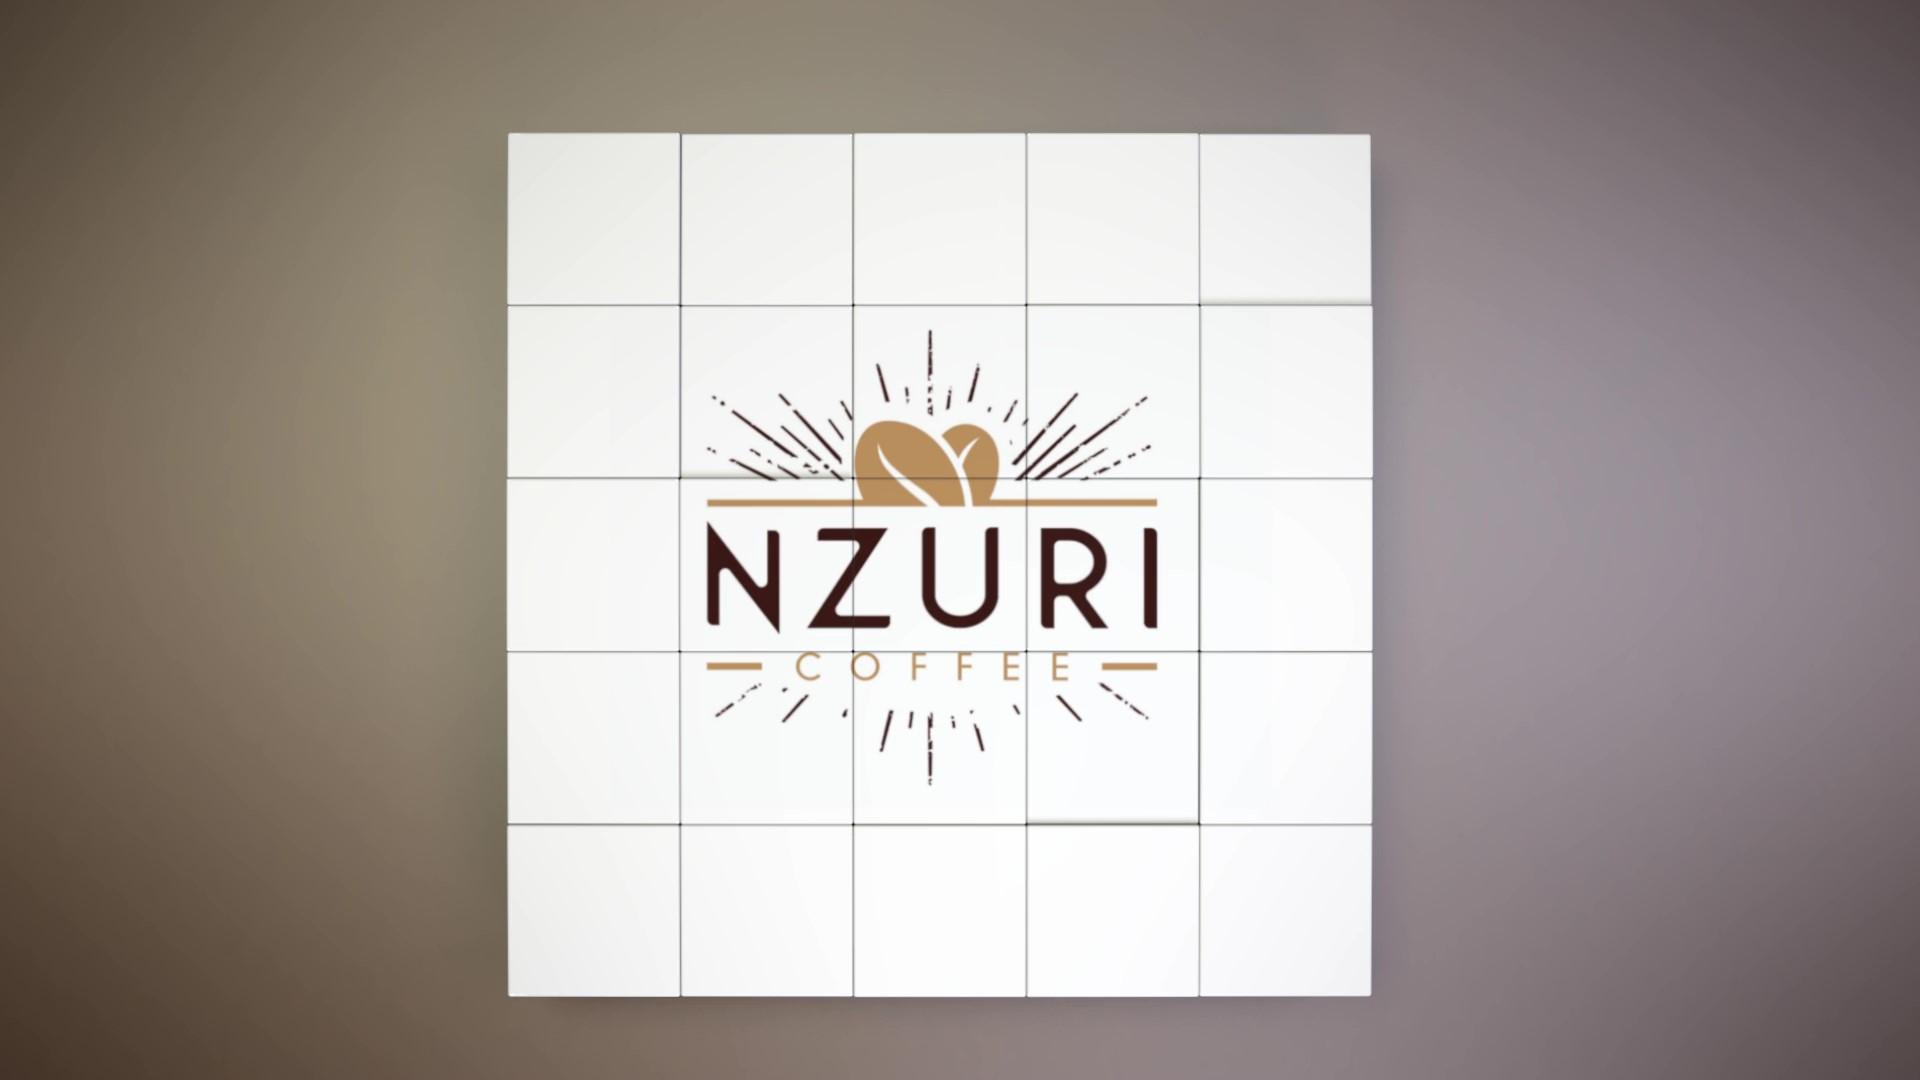 Nzuri Coffee